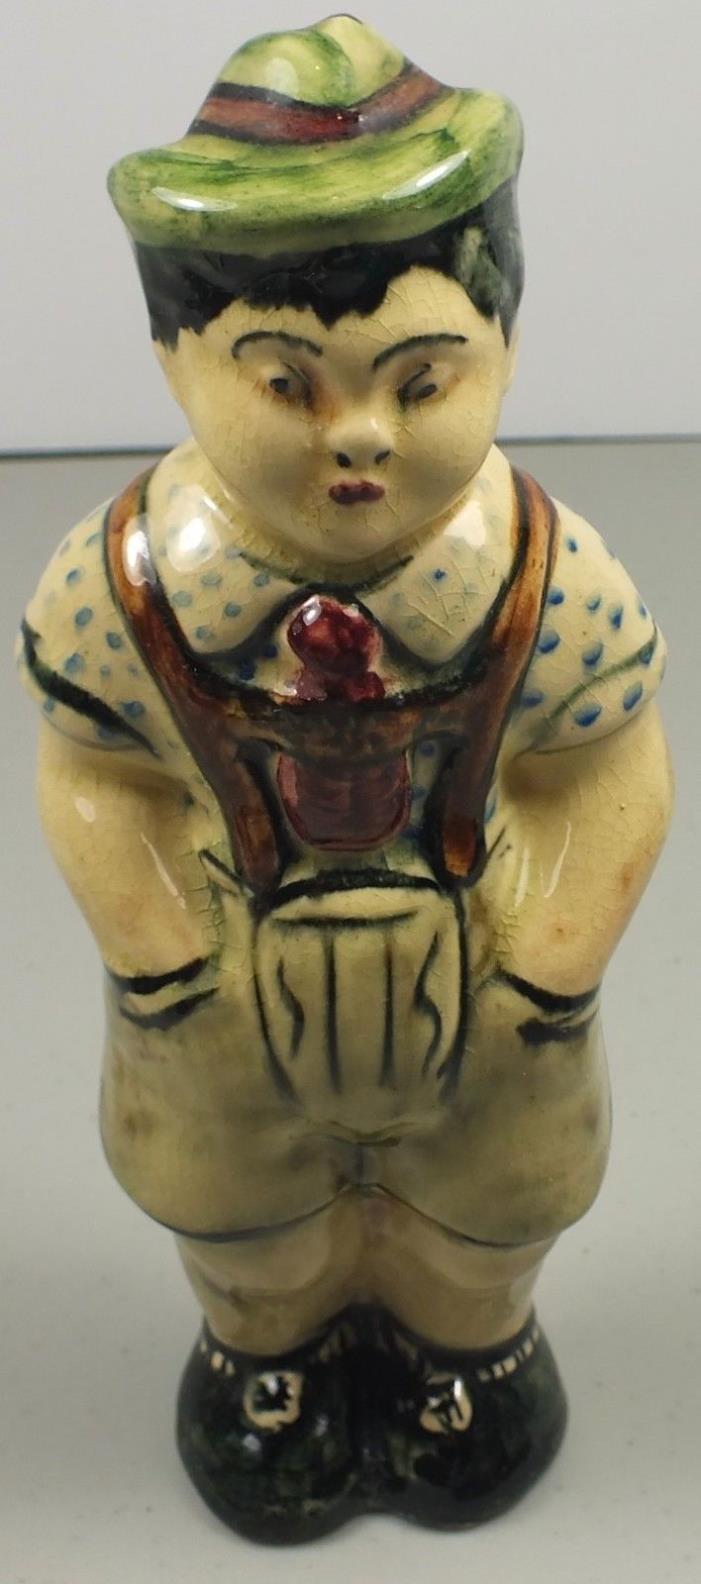 Antique Porcelain Mountain Guide Figurine Wearing Lederhosen & Hat